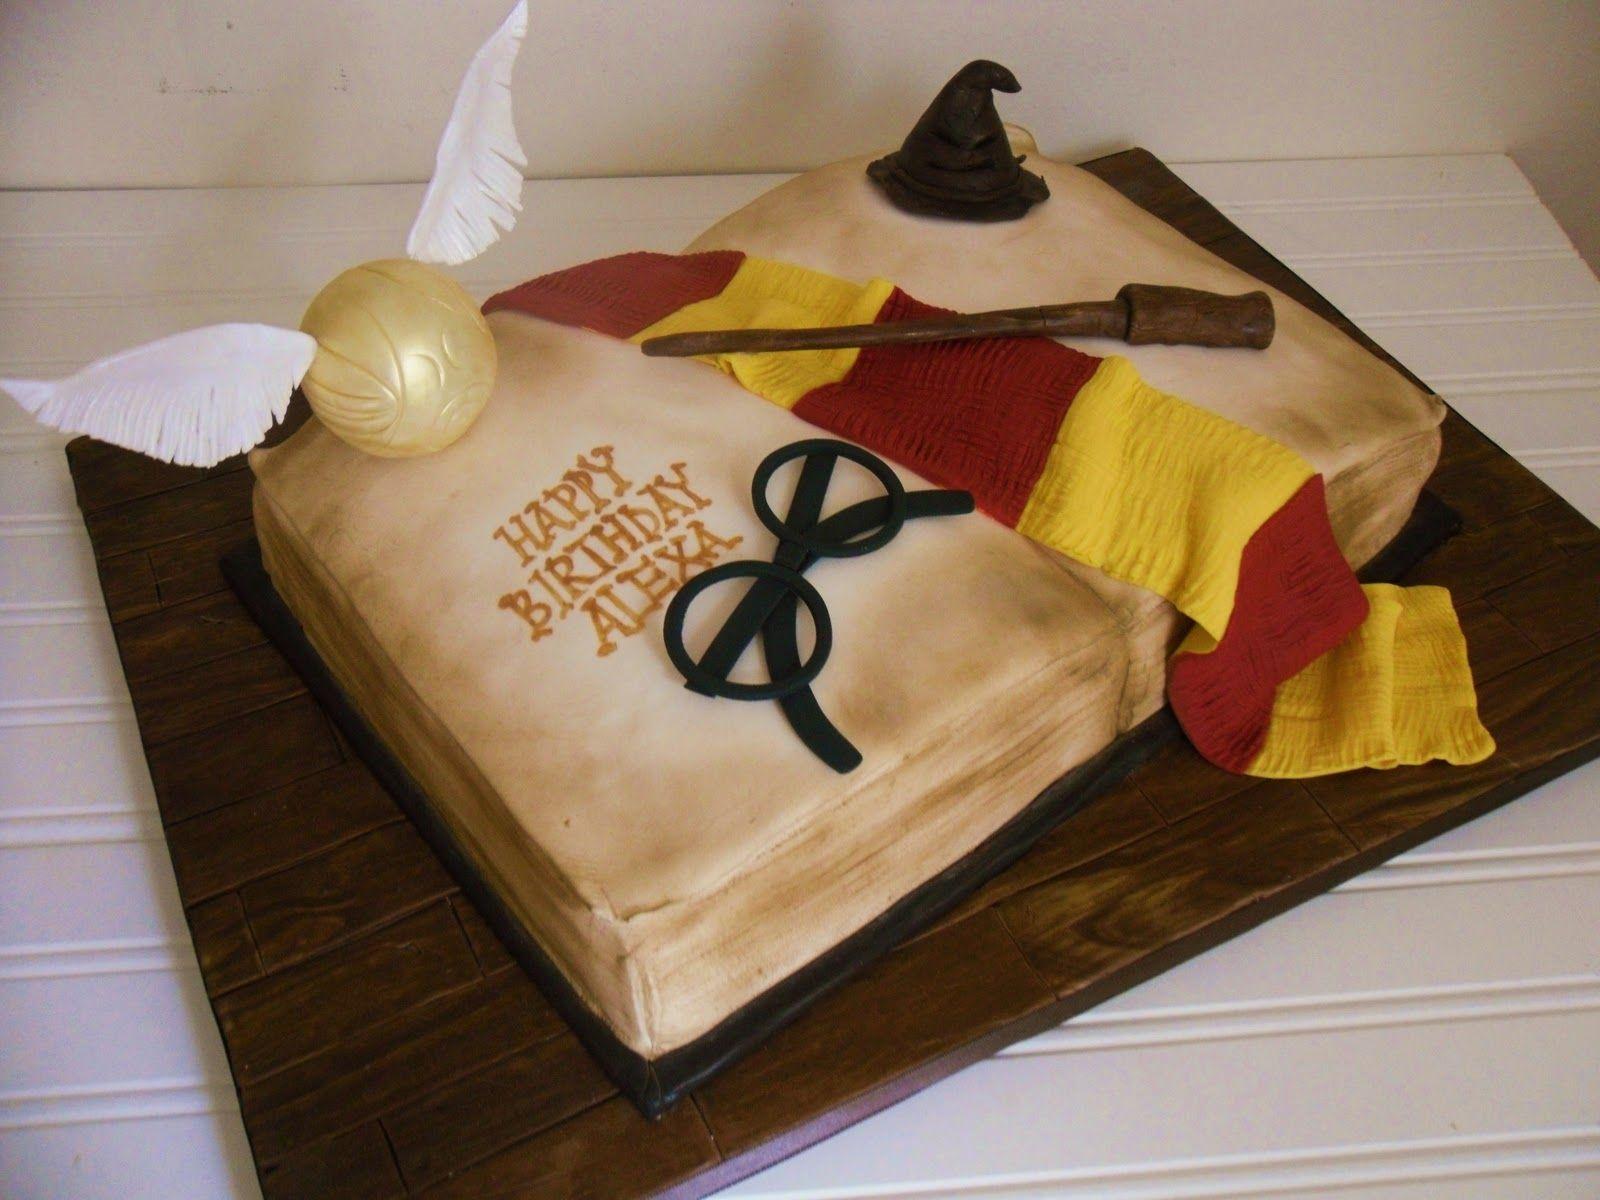 Harry Potter Harry potter spell book, Harry potter